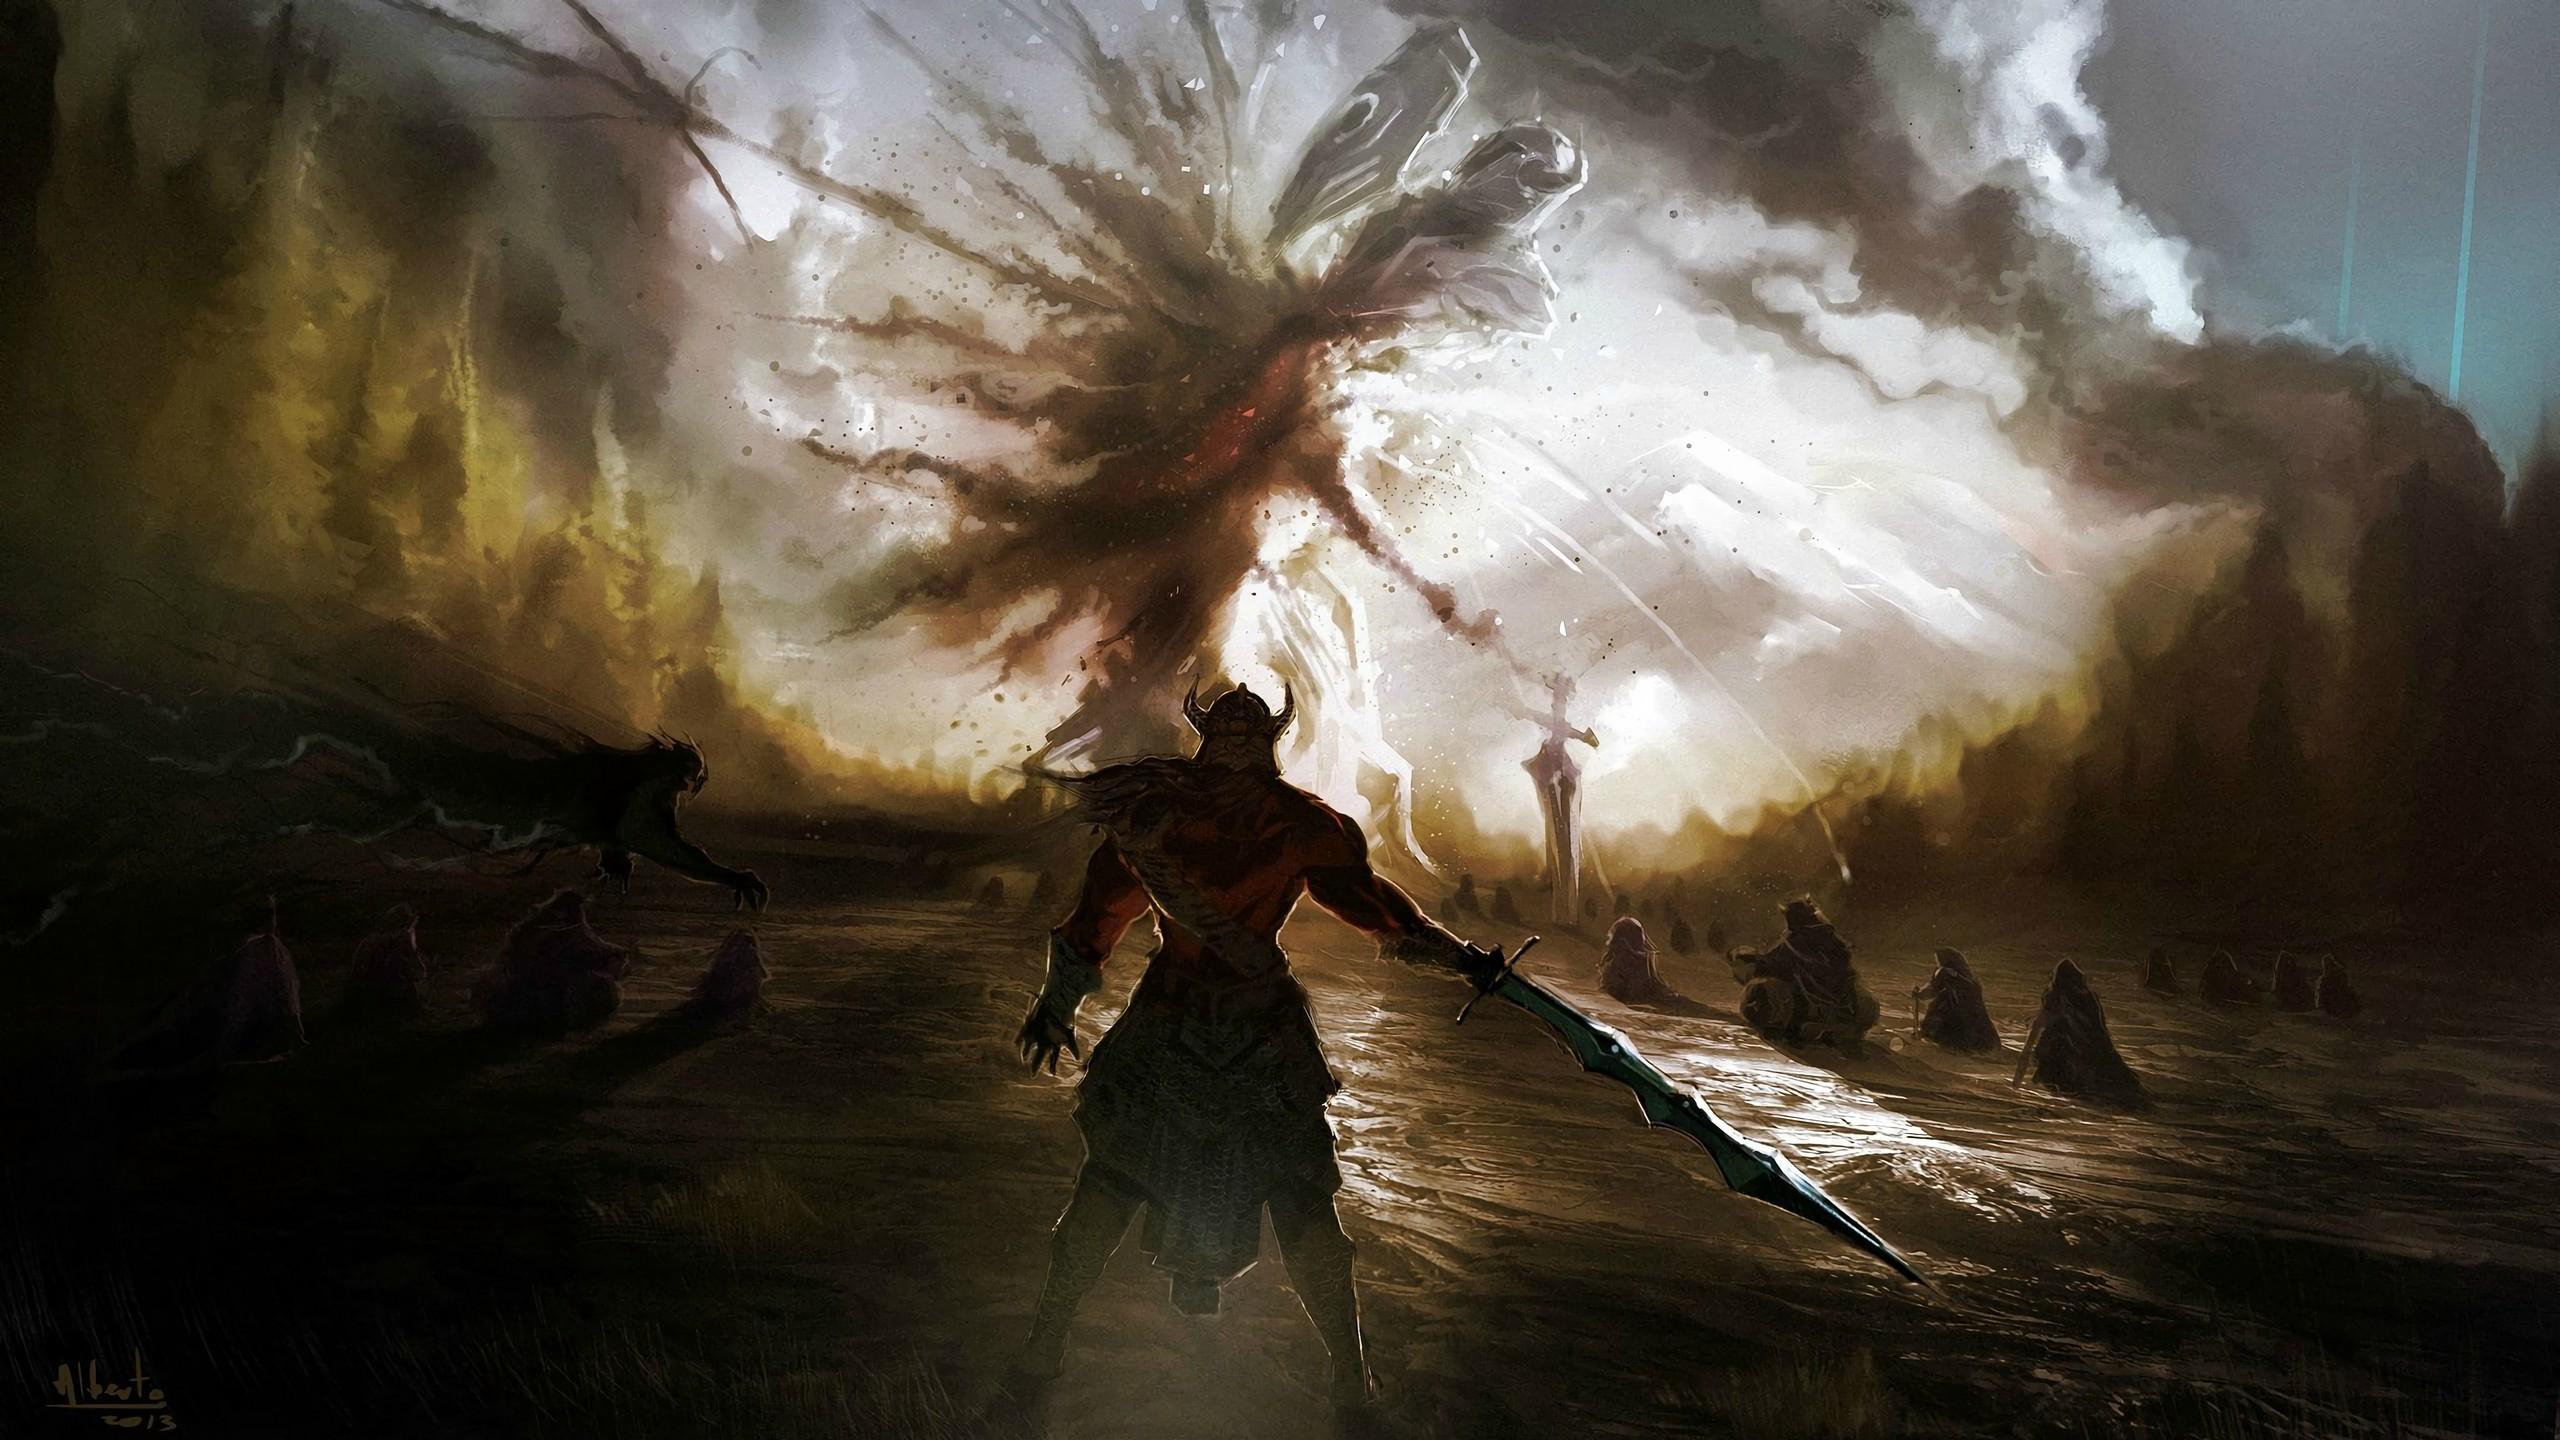 fantasy battle art wwwpixsharkcom images galleries